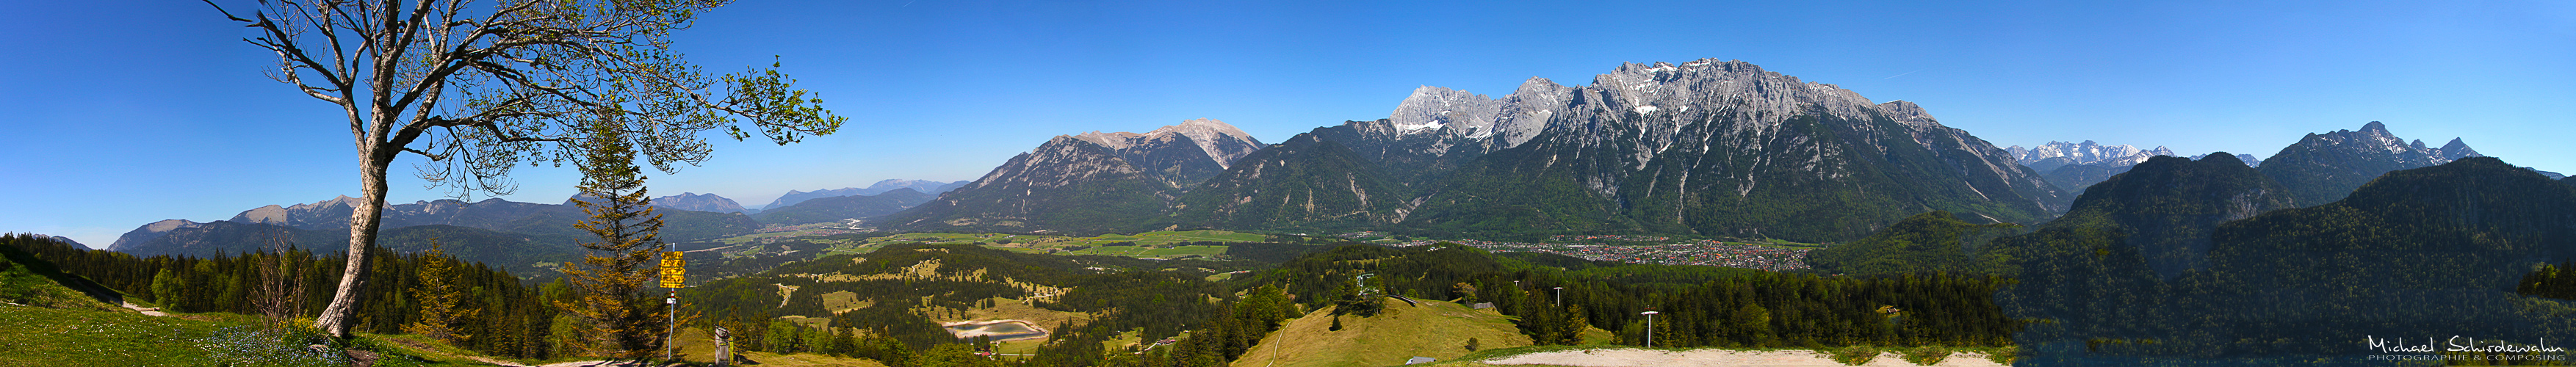 Panorama vom Karwendelgebirge